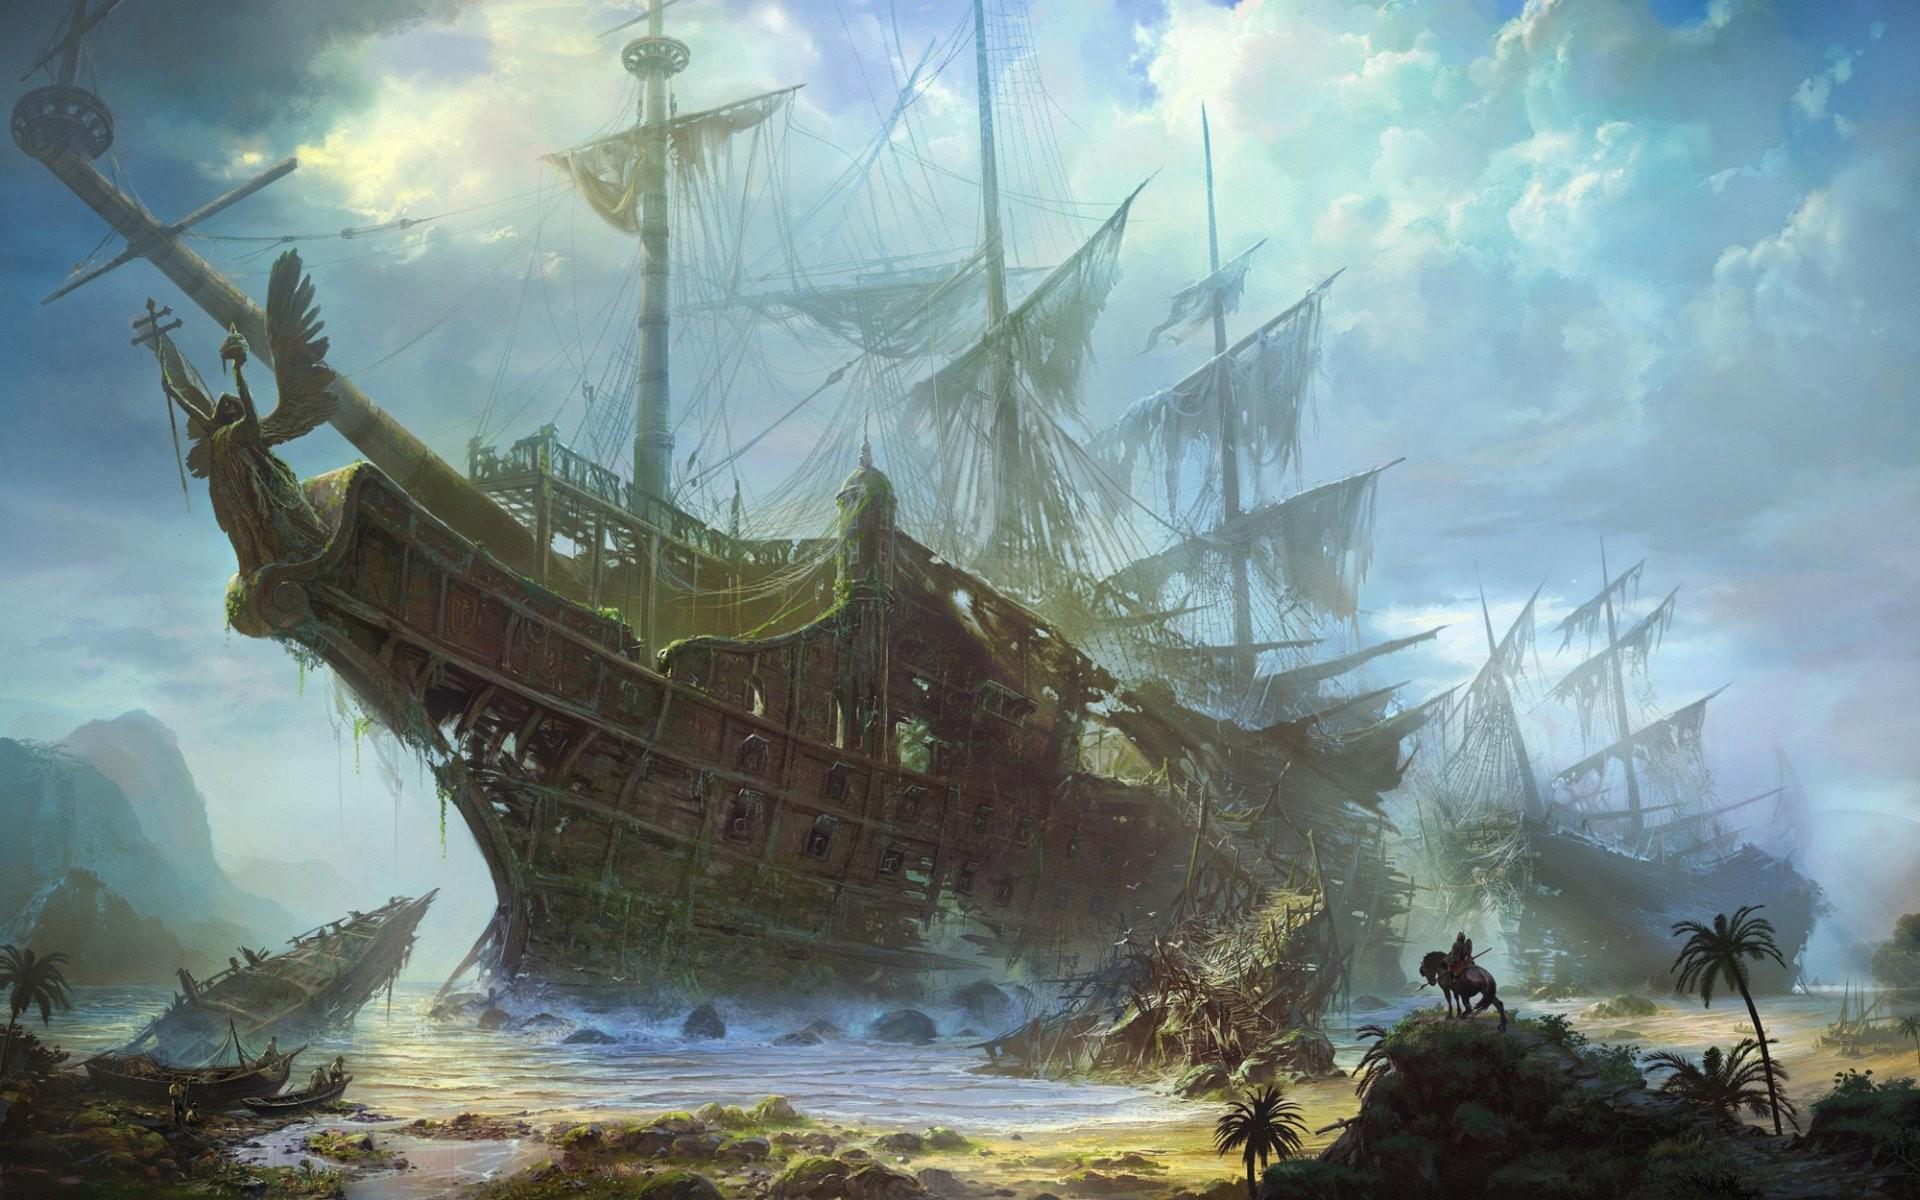 Wallpaper ghost ship